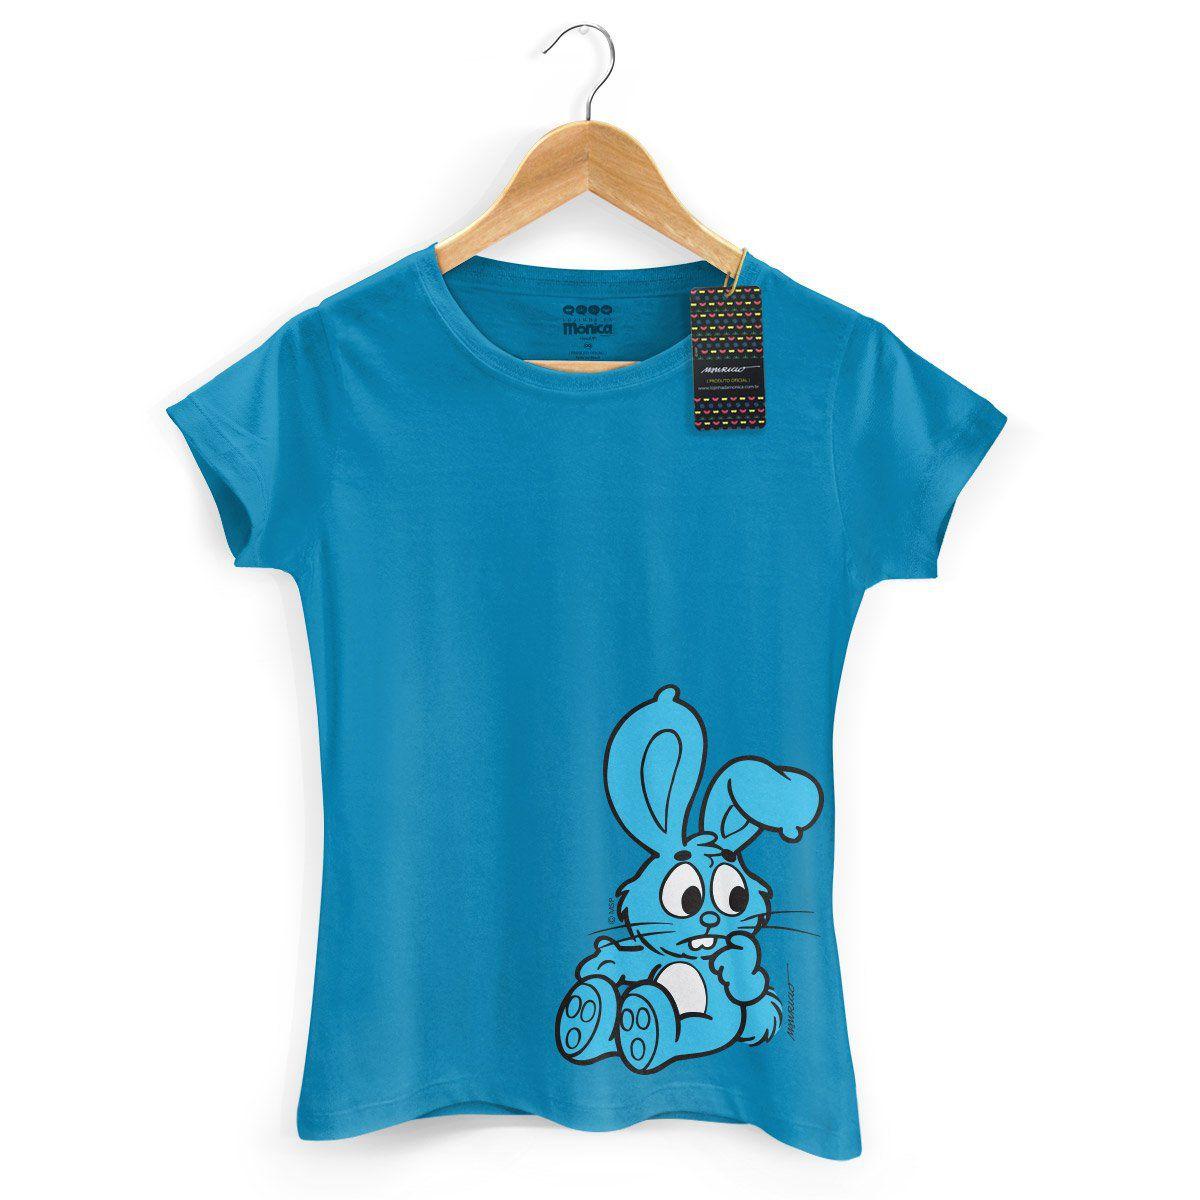 Camiseta Feminina Turma Da Mônica Kids Sansão Azul